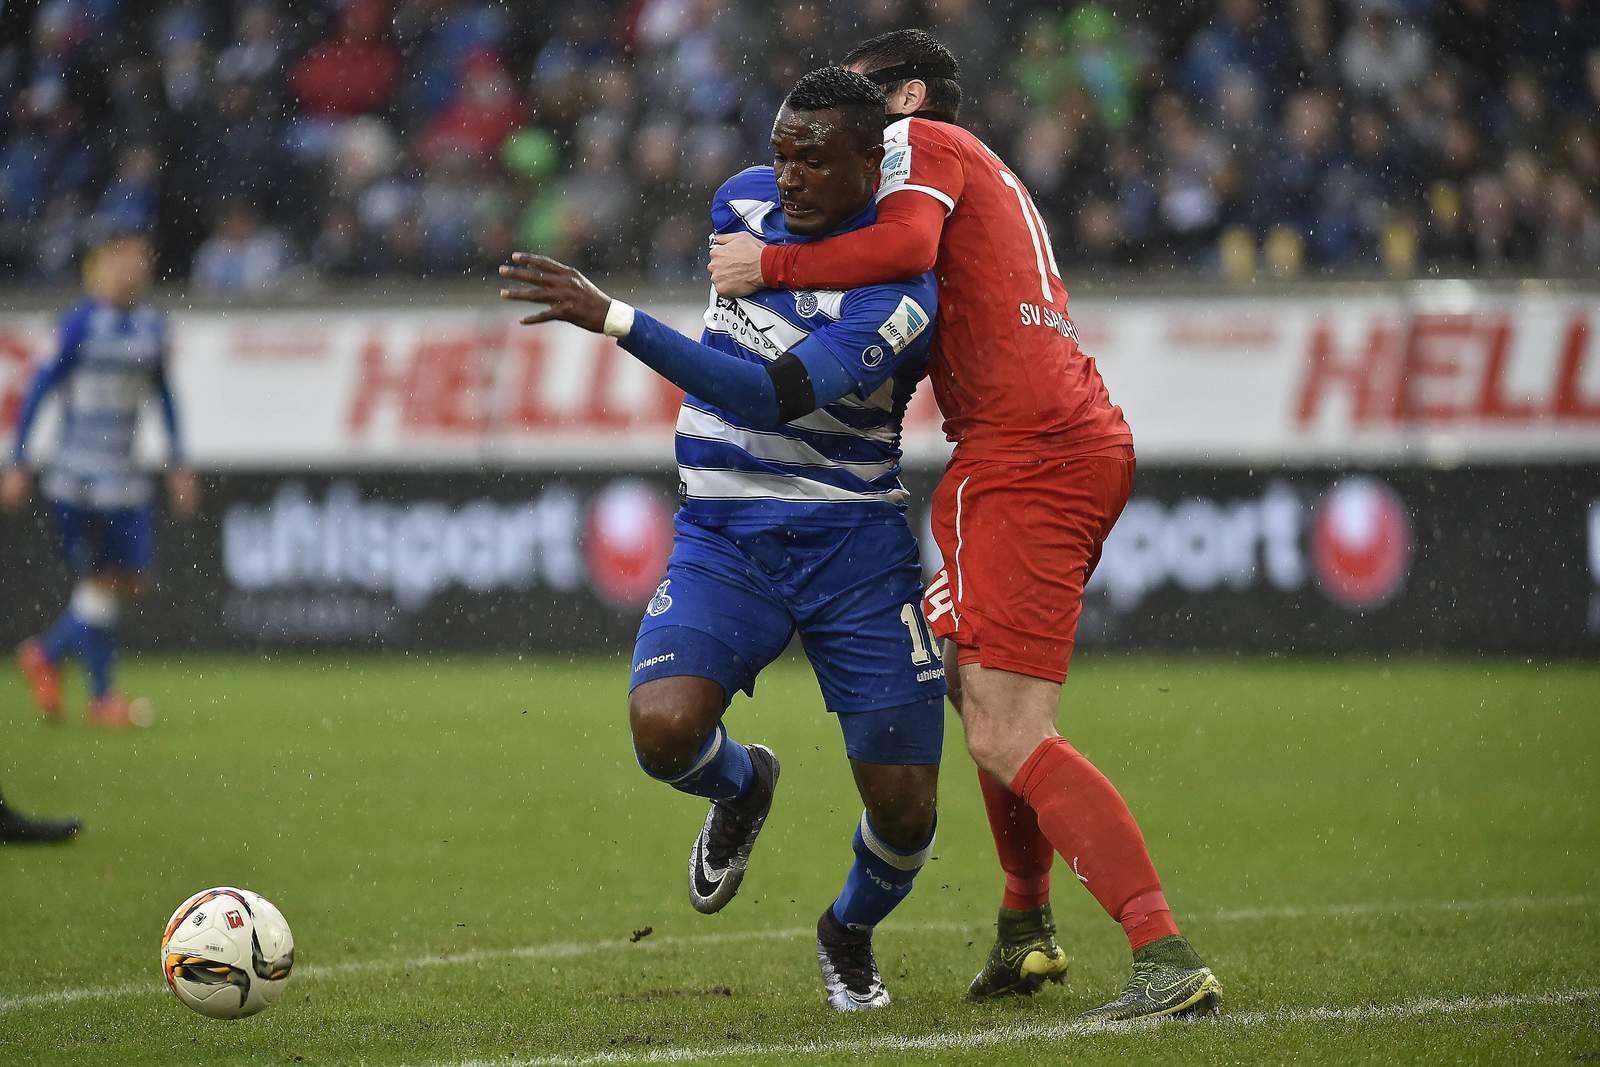 Kingsley Onuegbu vom MSV Duisburg im Klammergriff.